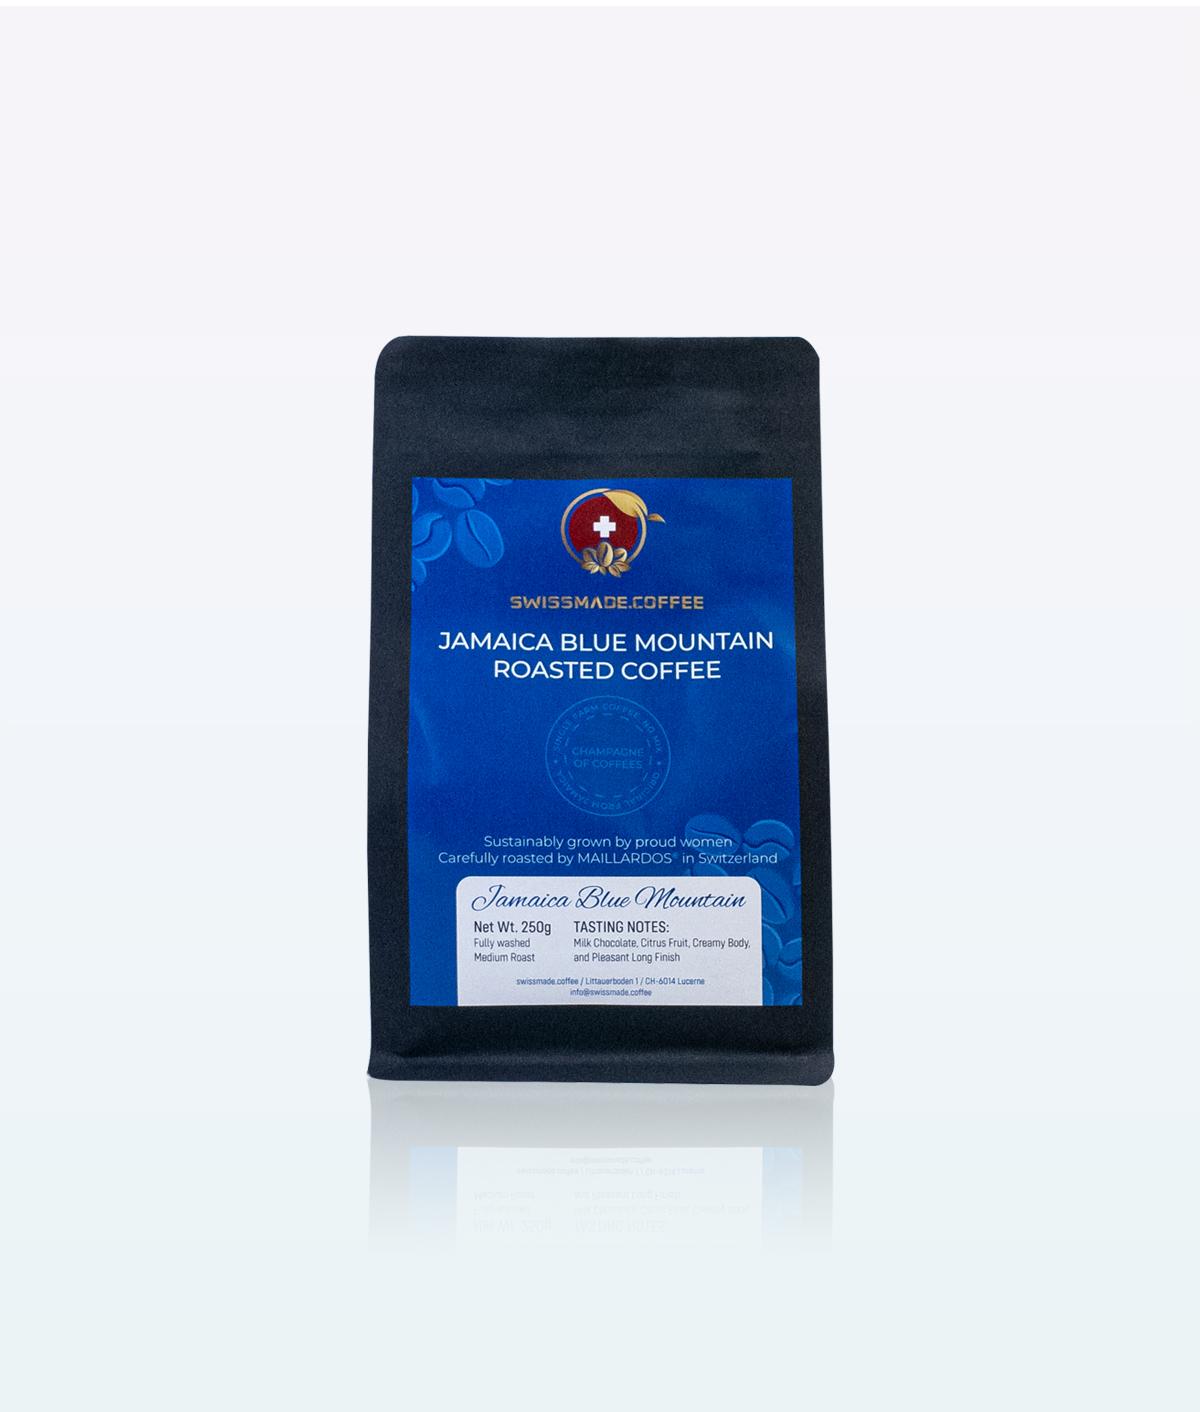 jamaica-blue-mountain-roasted-coffee